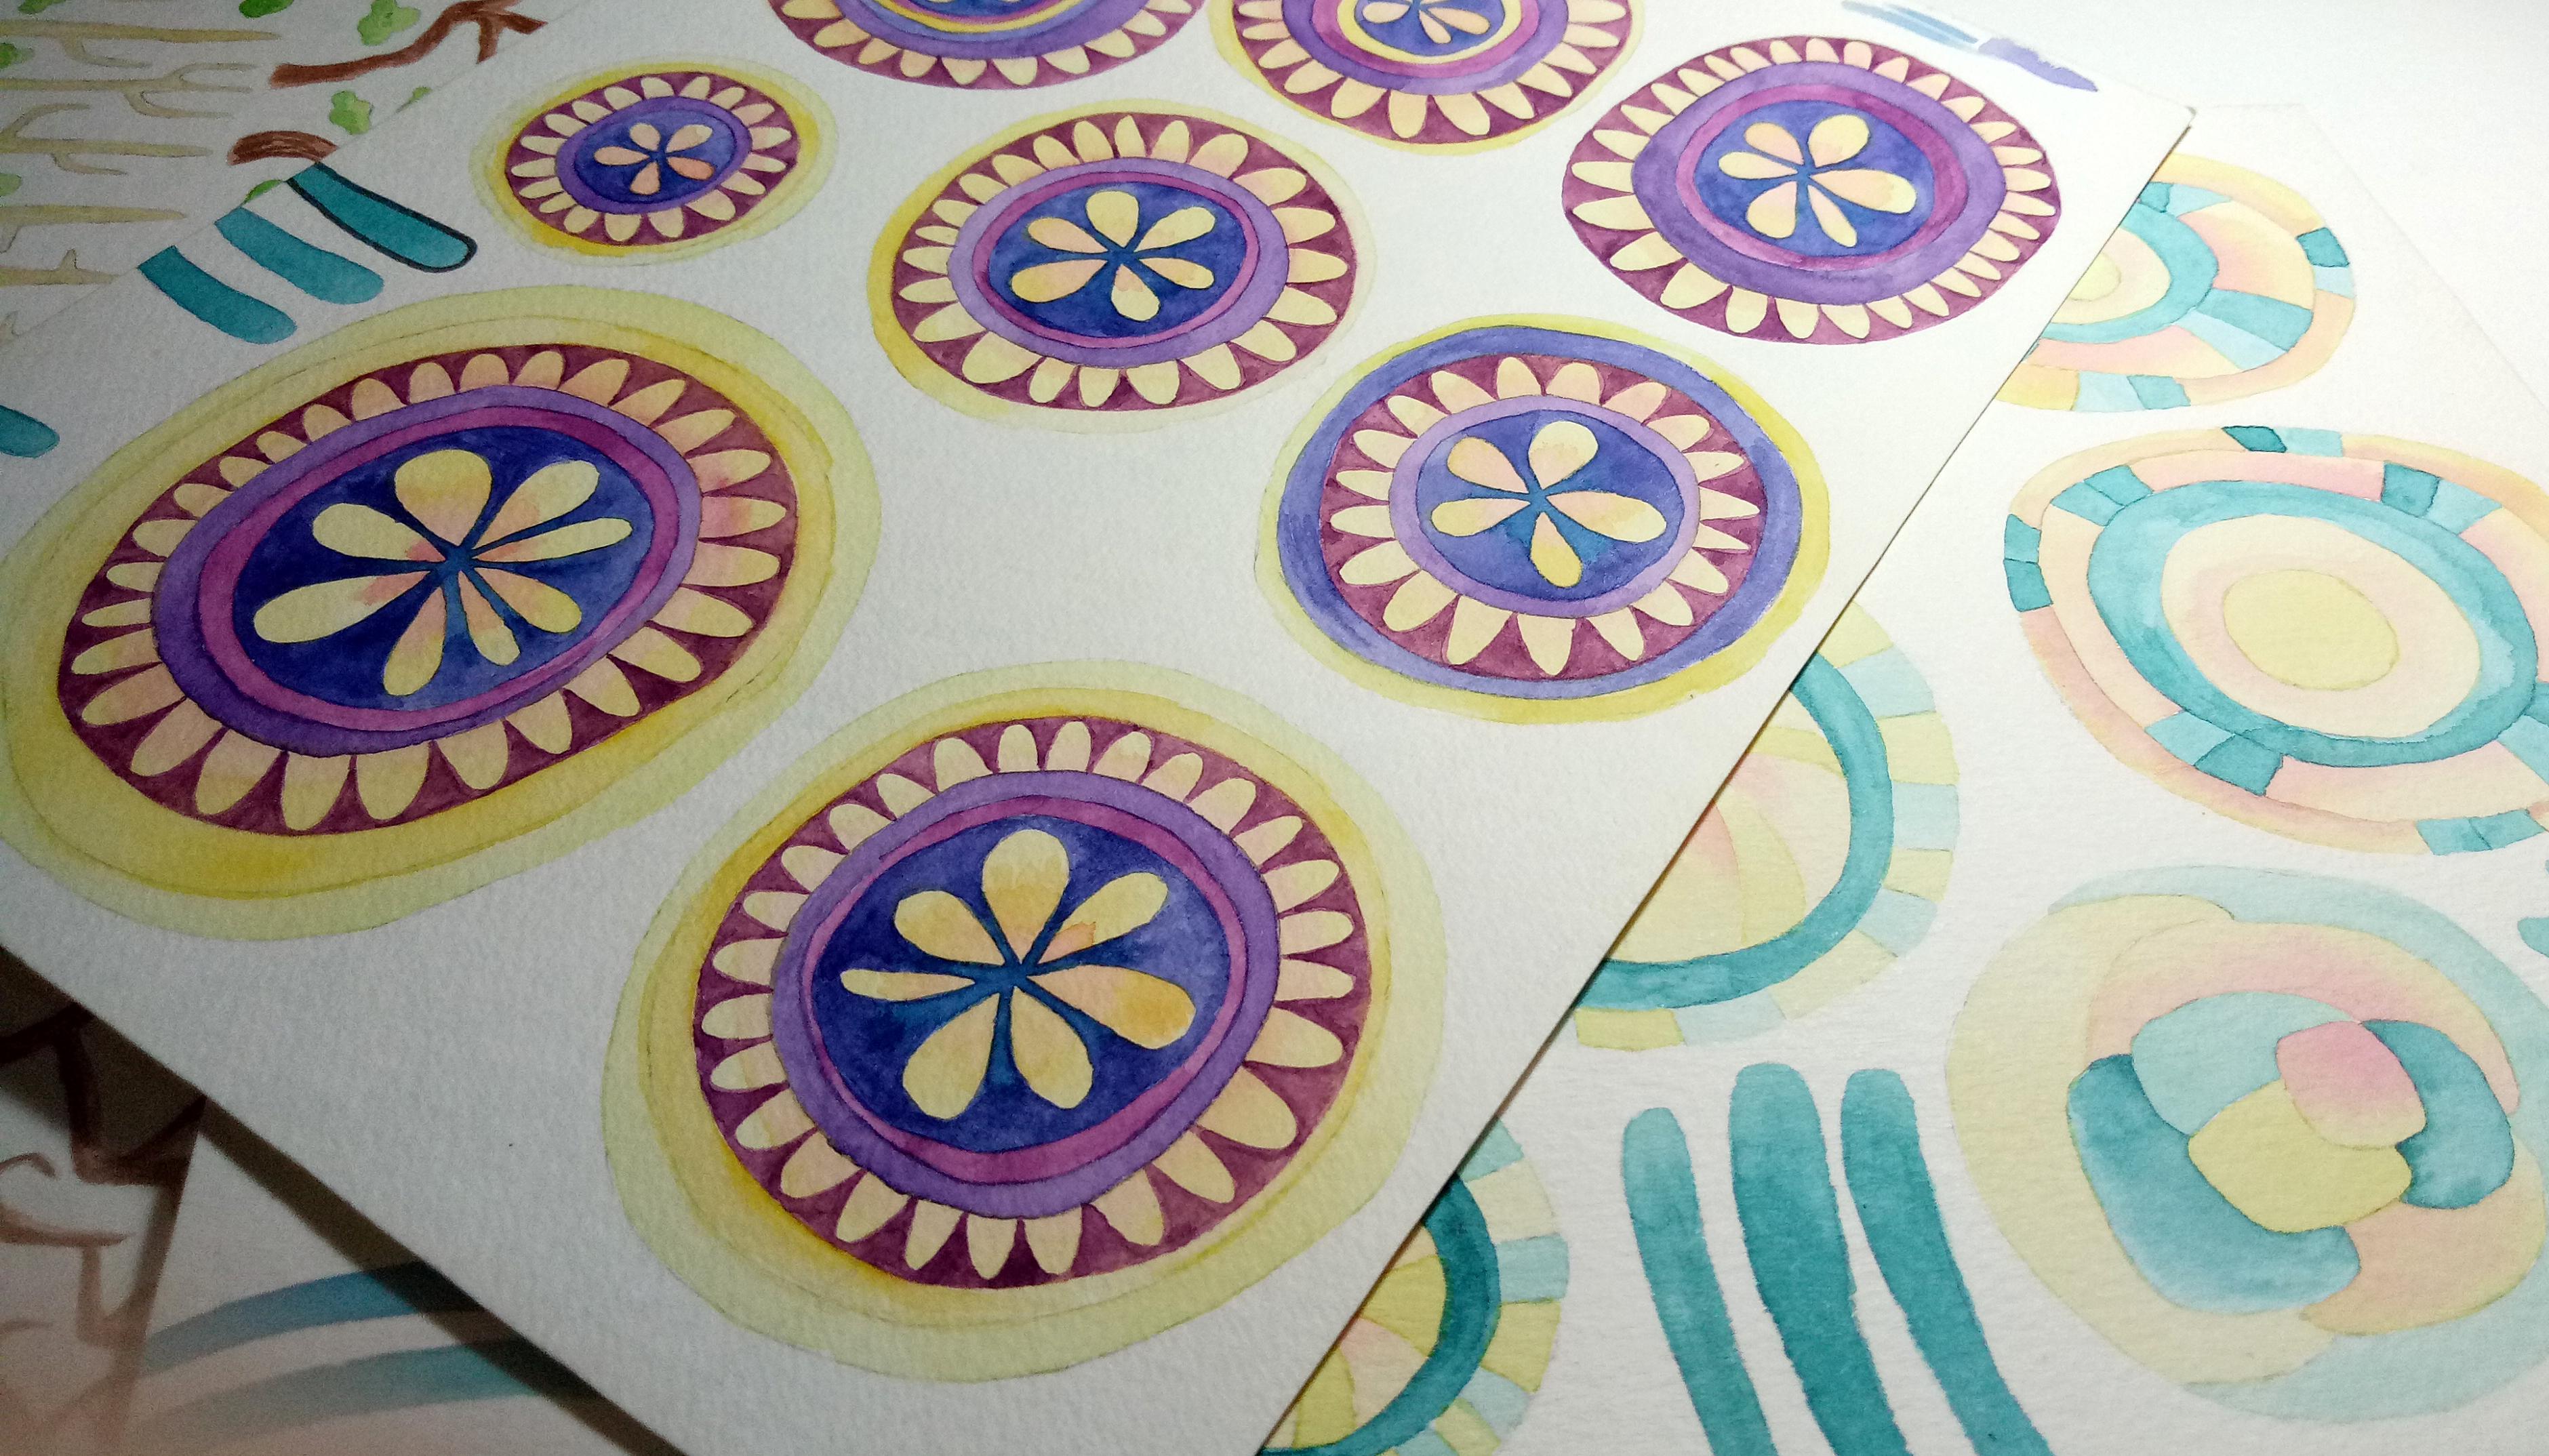 watercolor assets